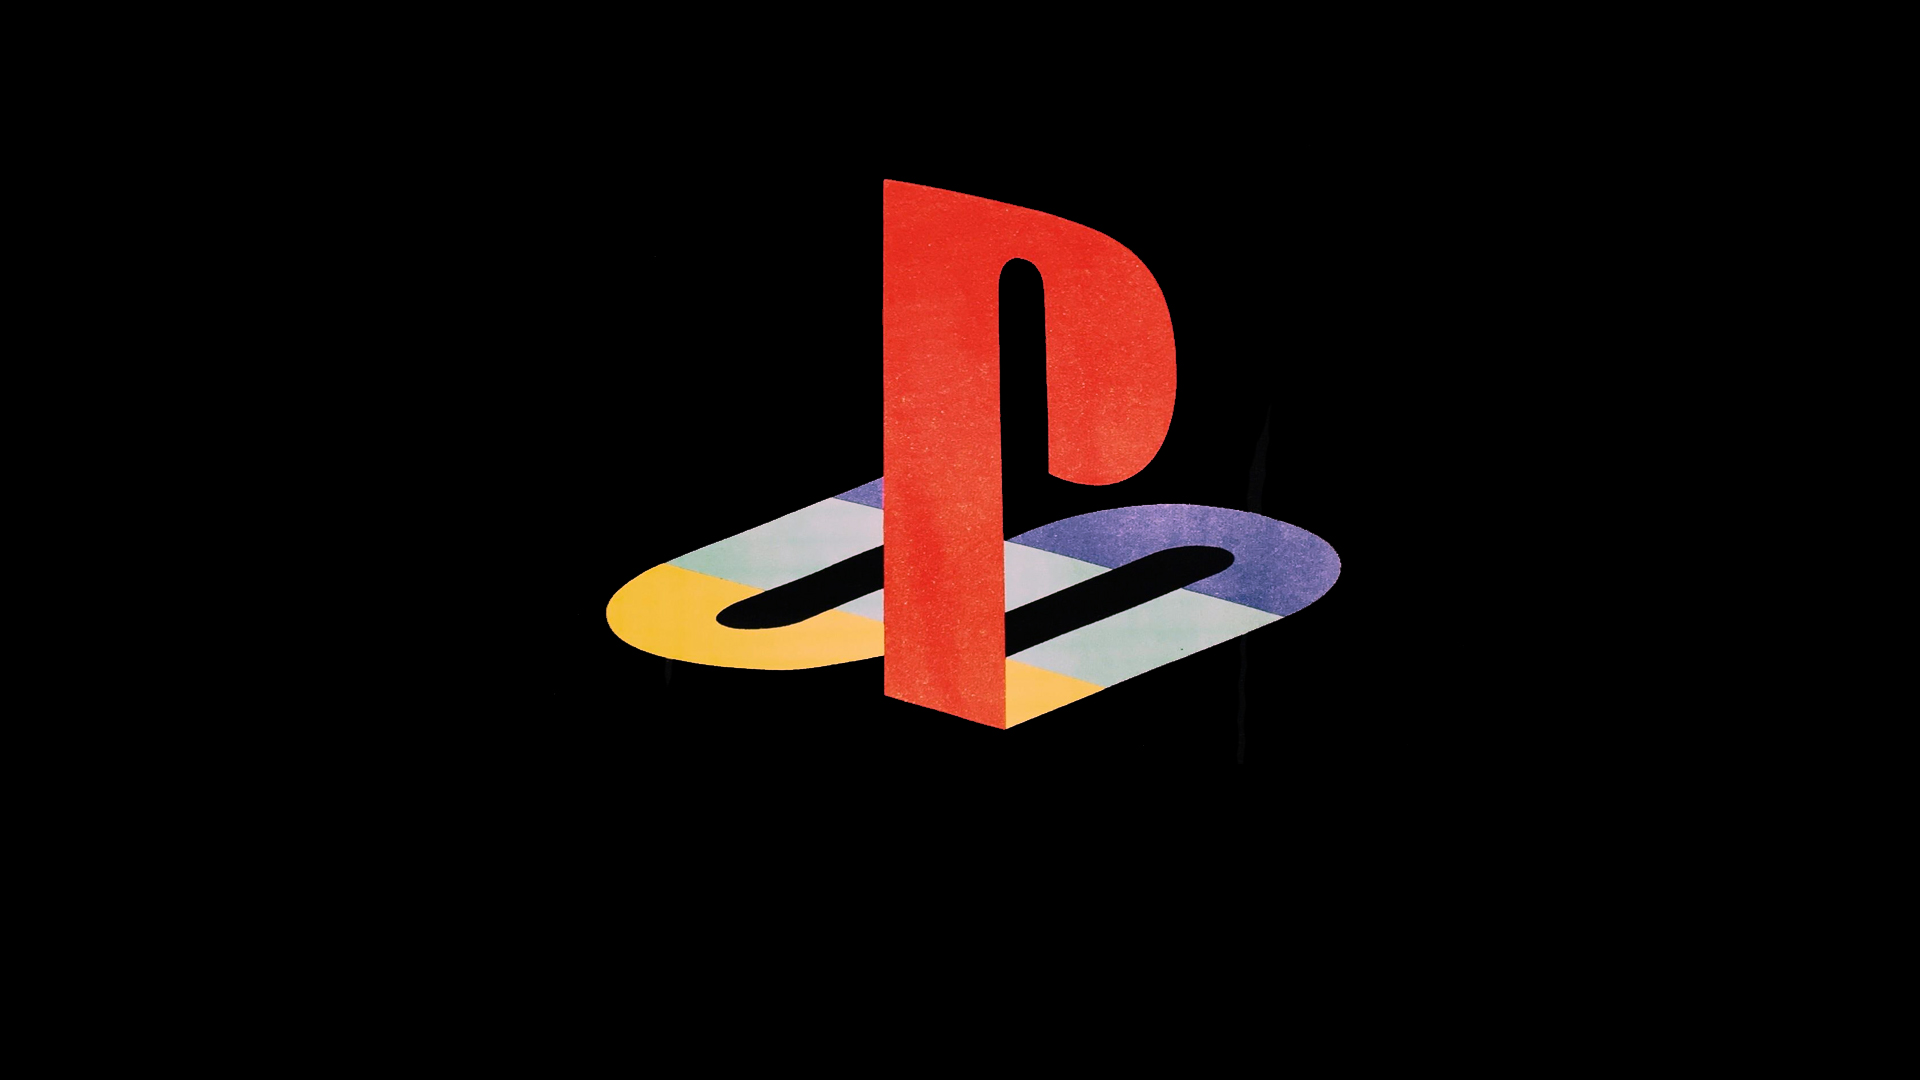 playstation logo, hd logo, 4k wallpapers, images, backgrounds